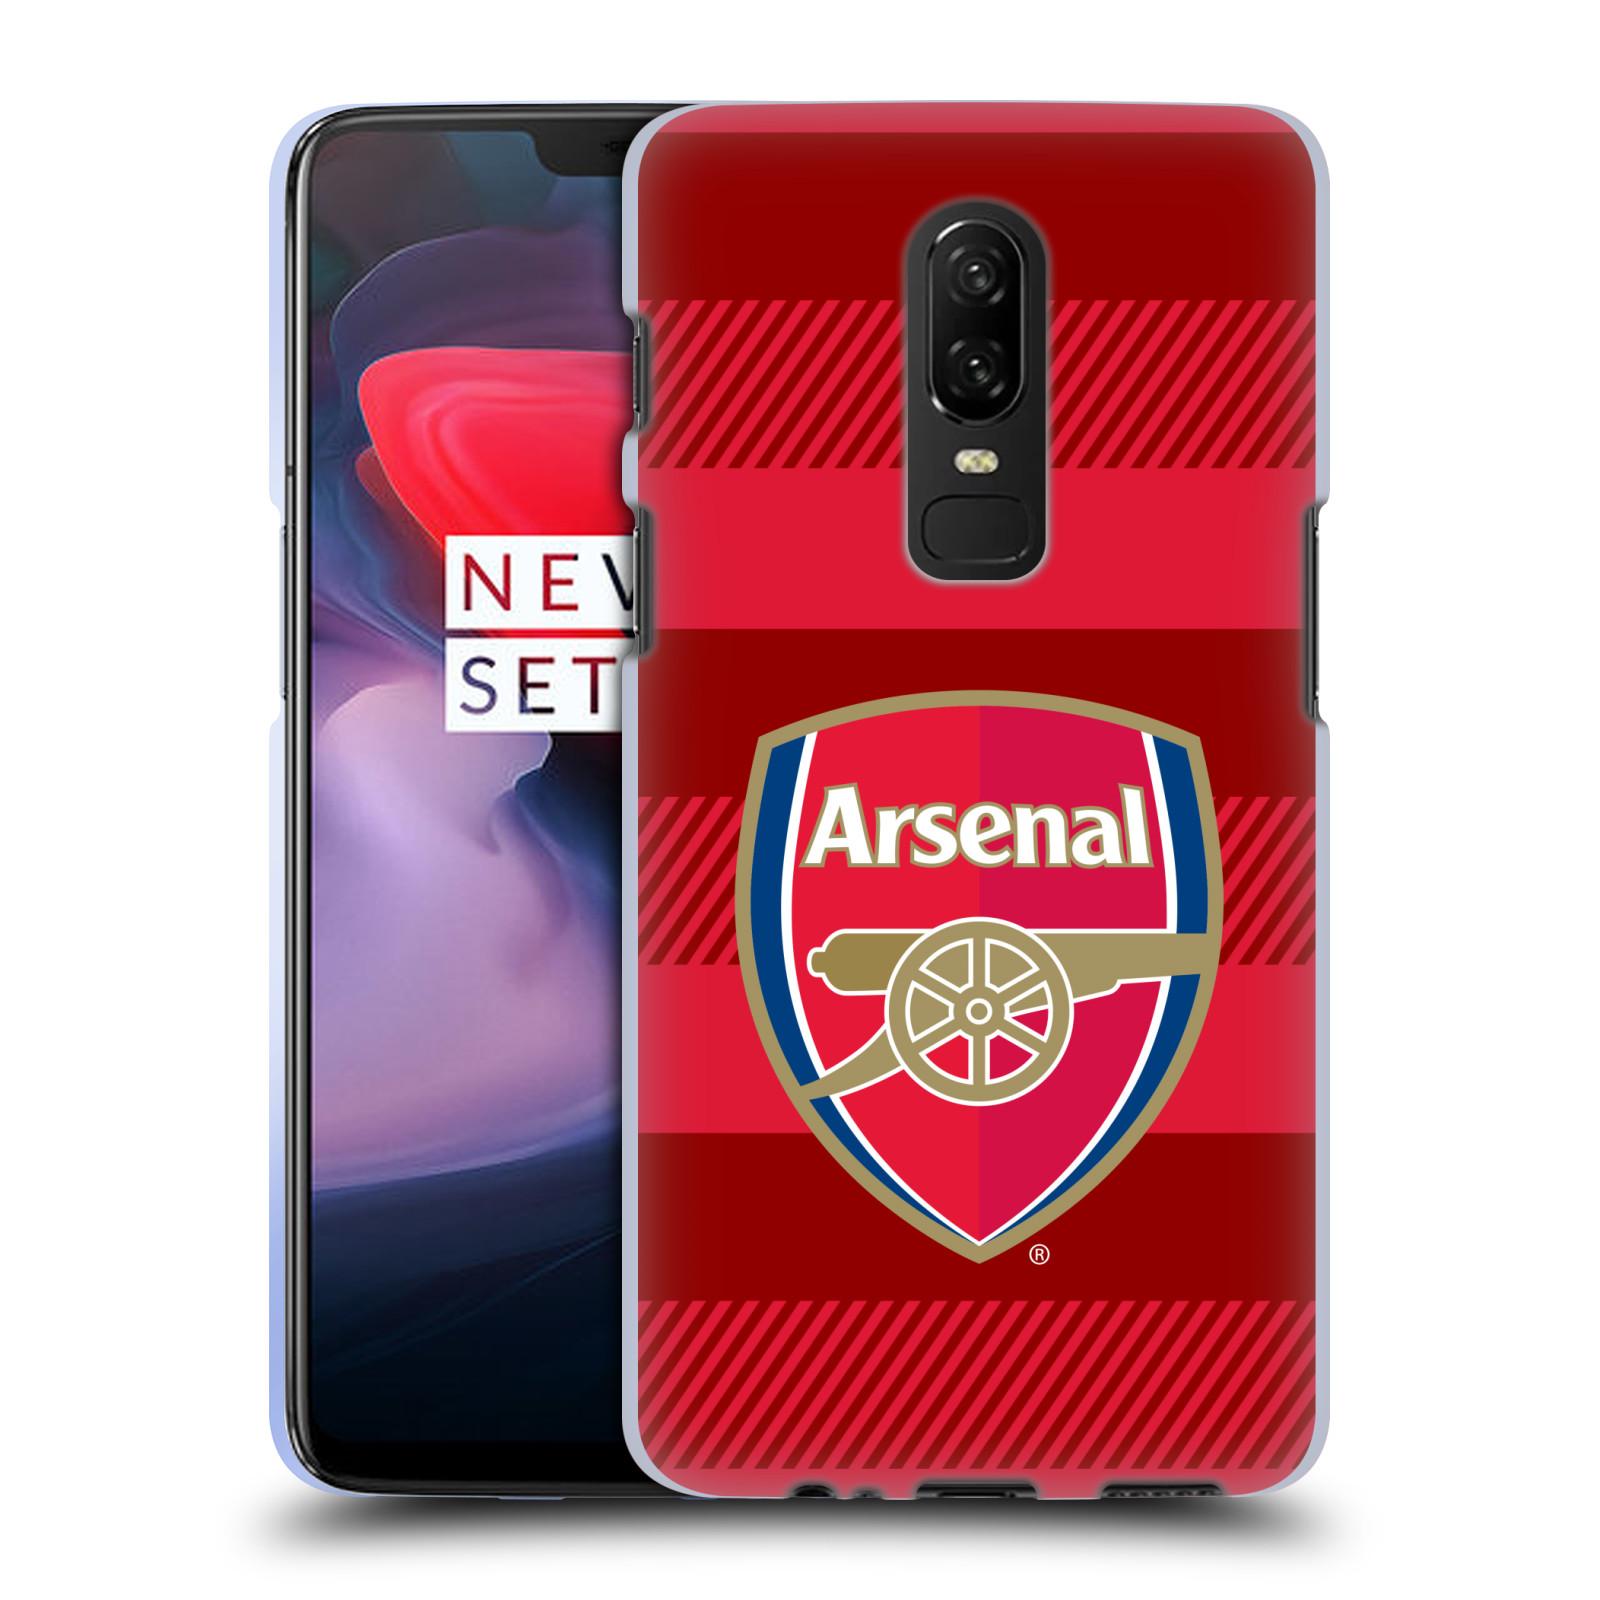 Silikonové pouzdro na mobil OnePlus 6 - Head Case - Arsenal FC - Logo s pruhy